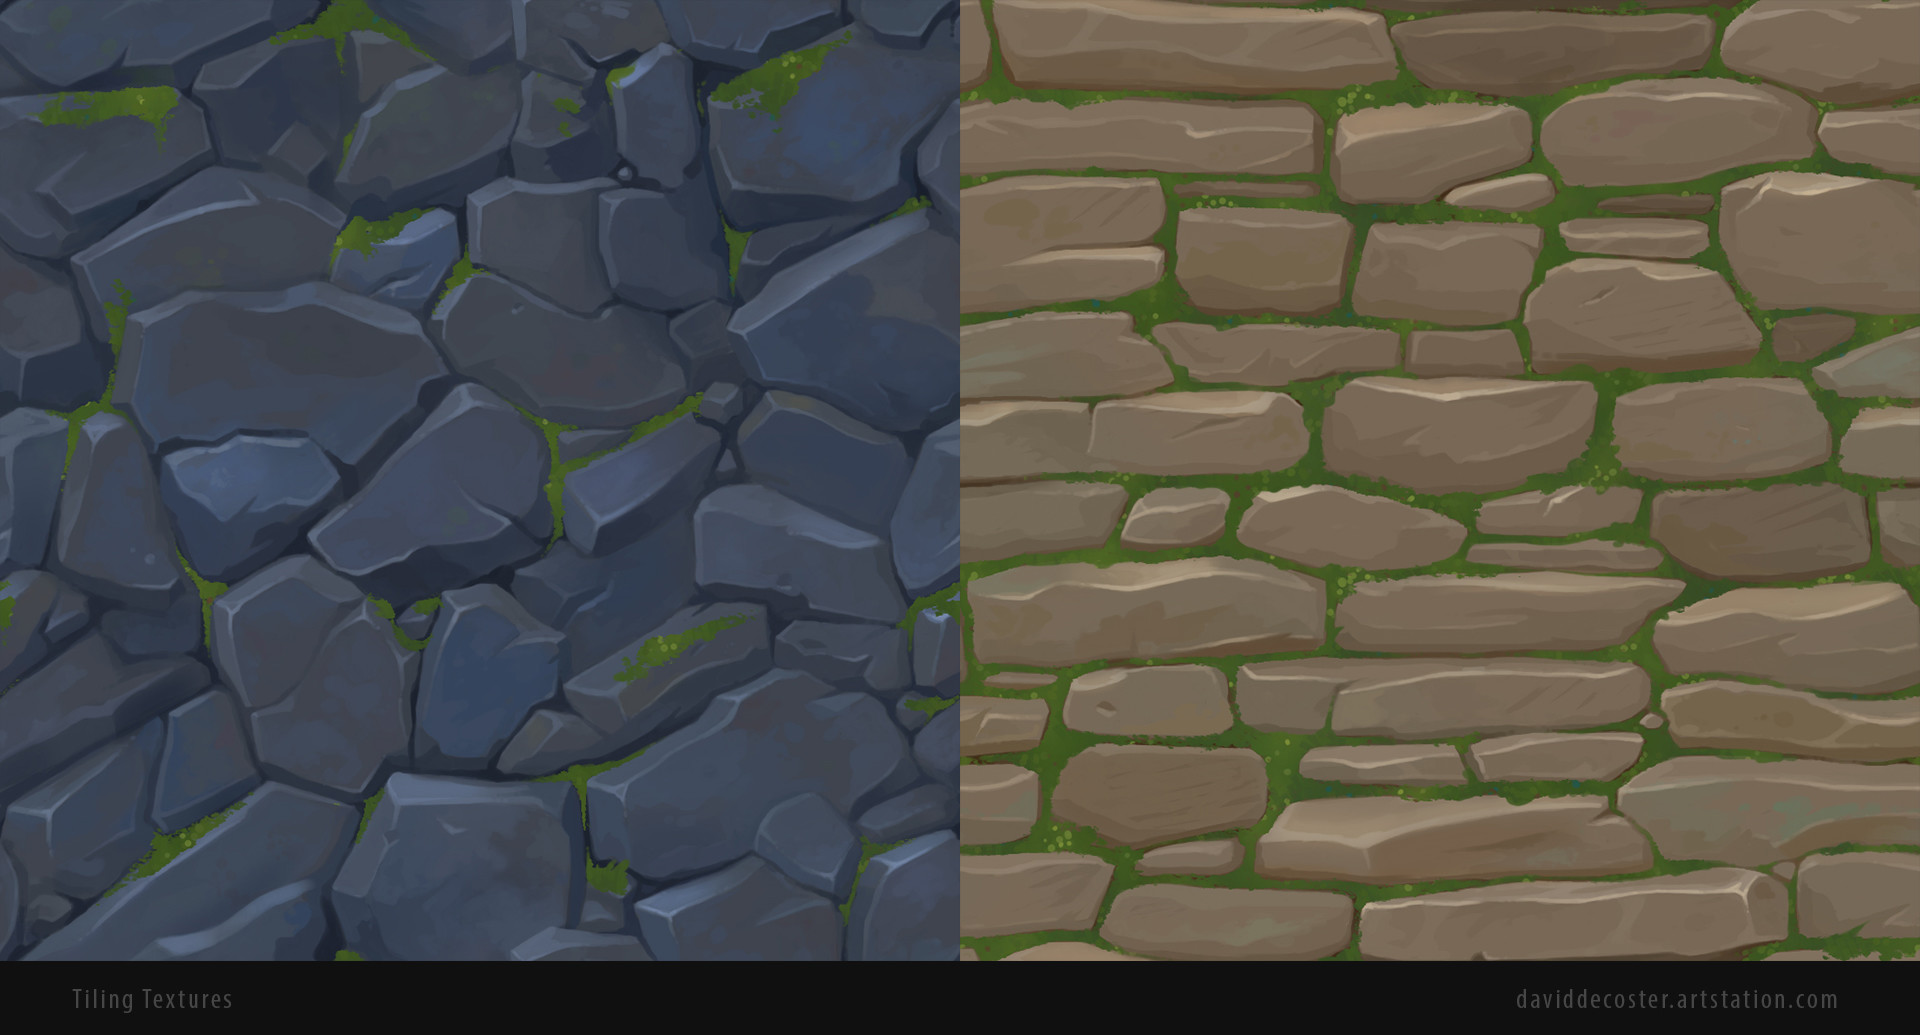 David decoster decoster tiling textures 01b